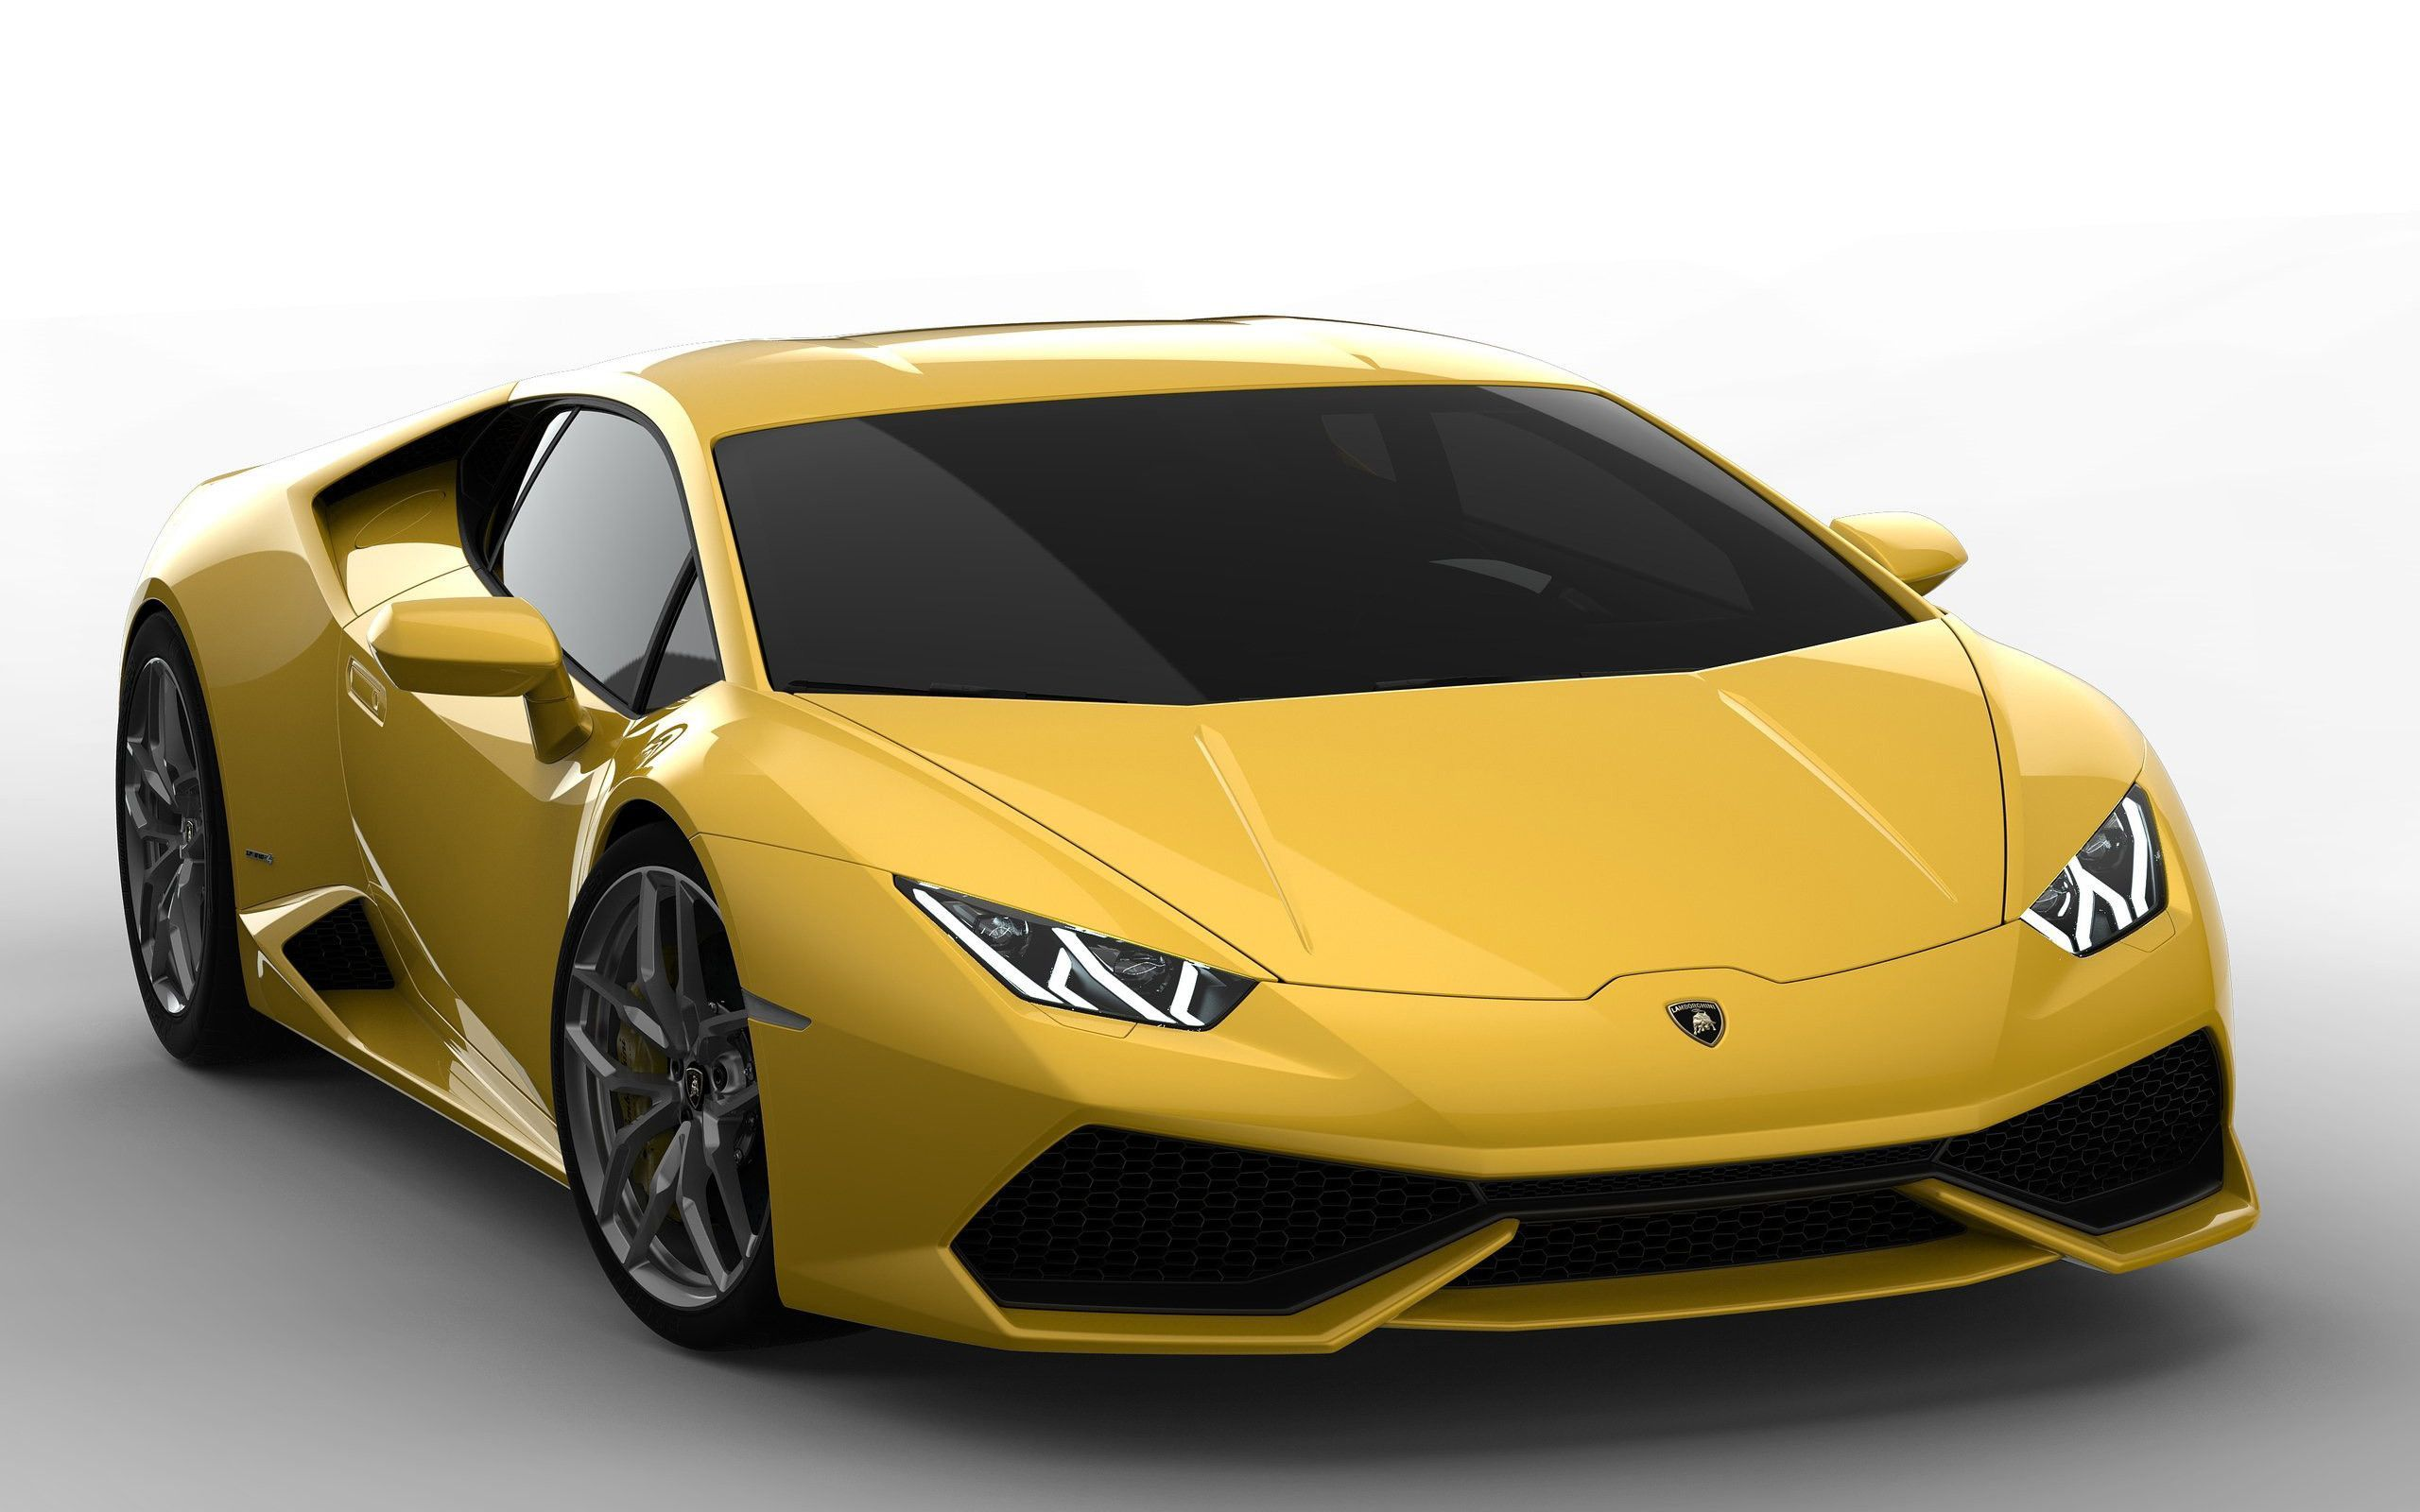 Lamborghini Huracan Wallpapers High Definition Lamborghini Huracan Lamborghini Cars Super Sport Cars